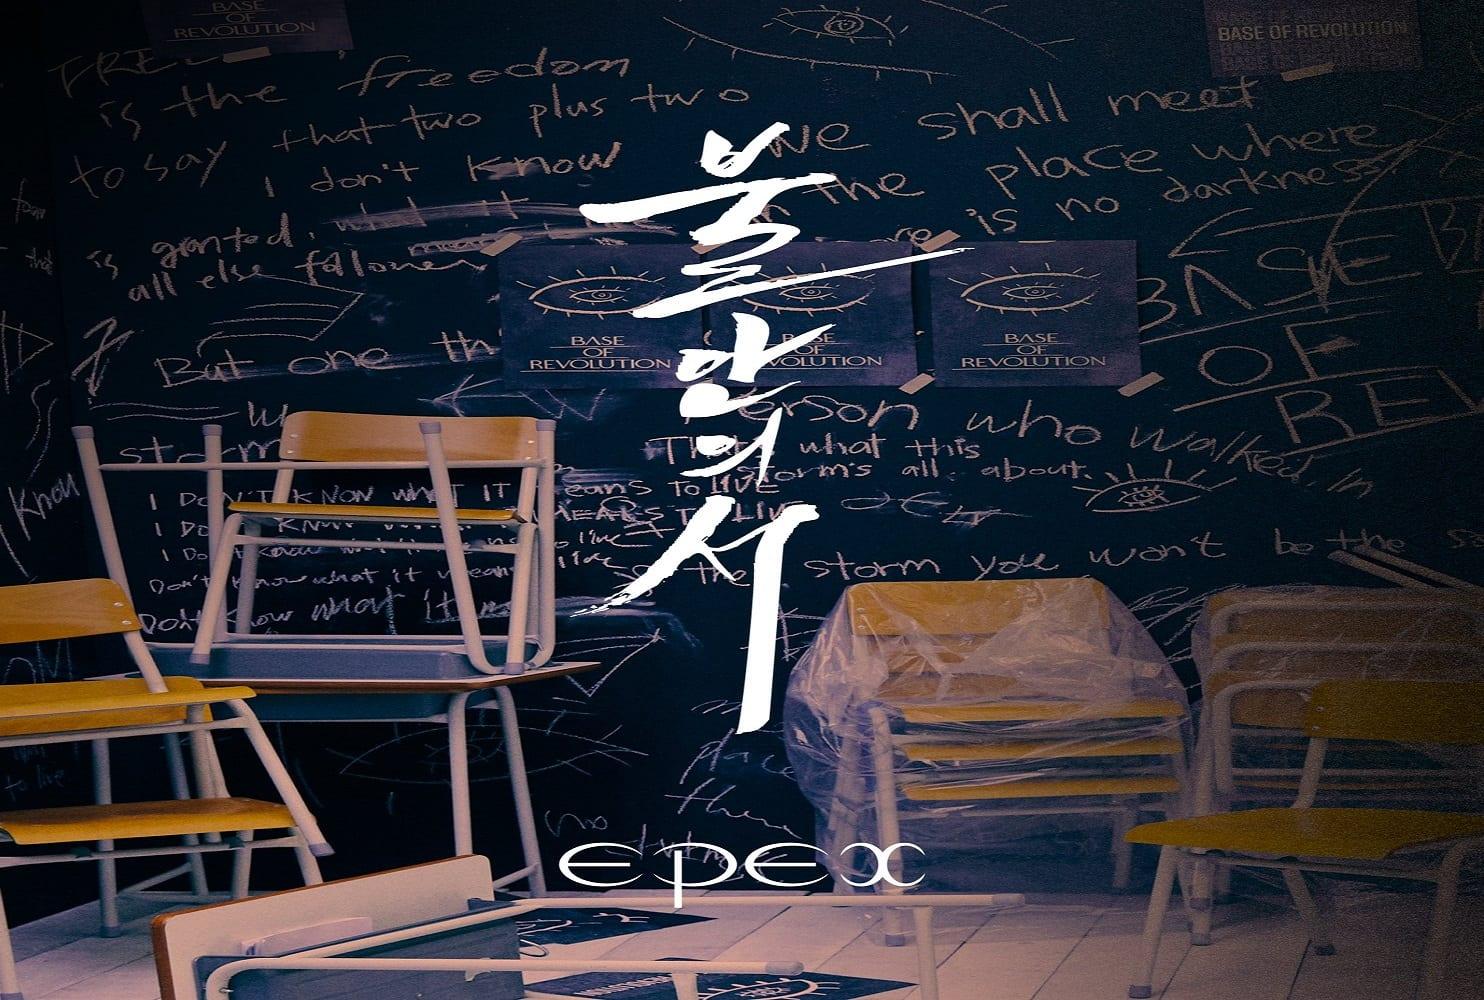 C9 Entertainment's EPEX debut album